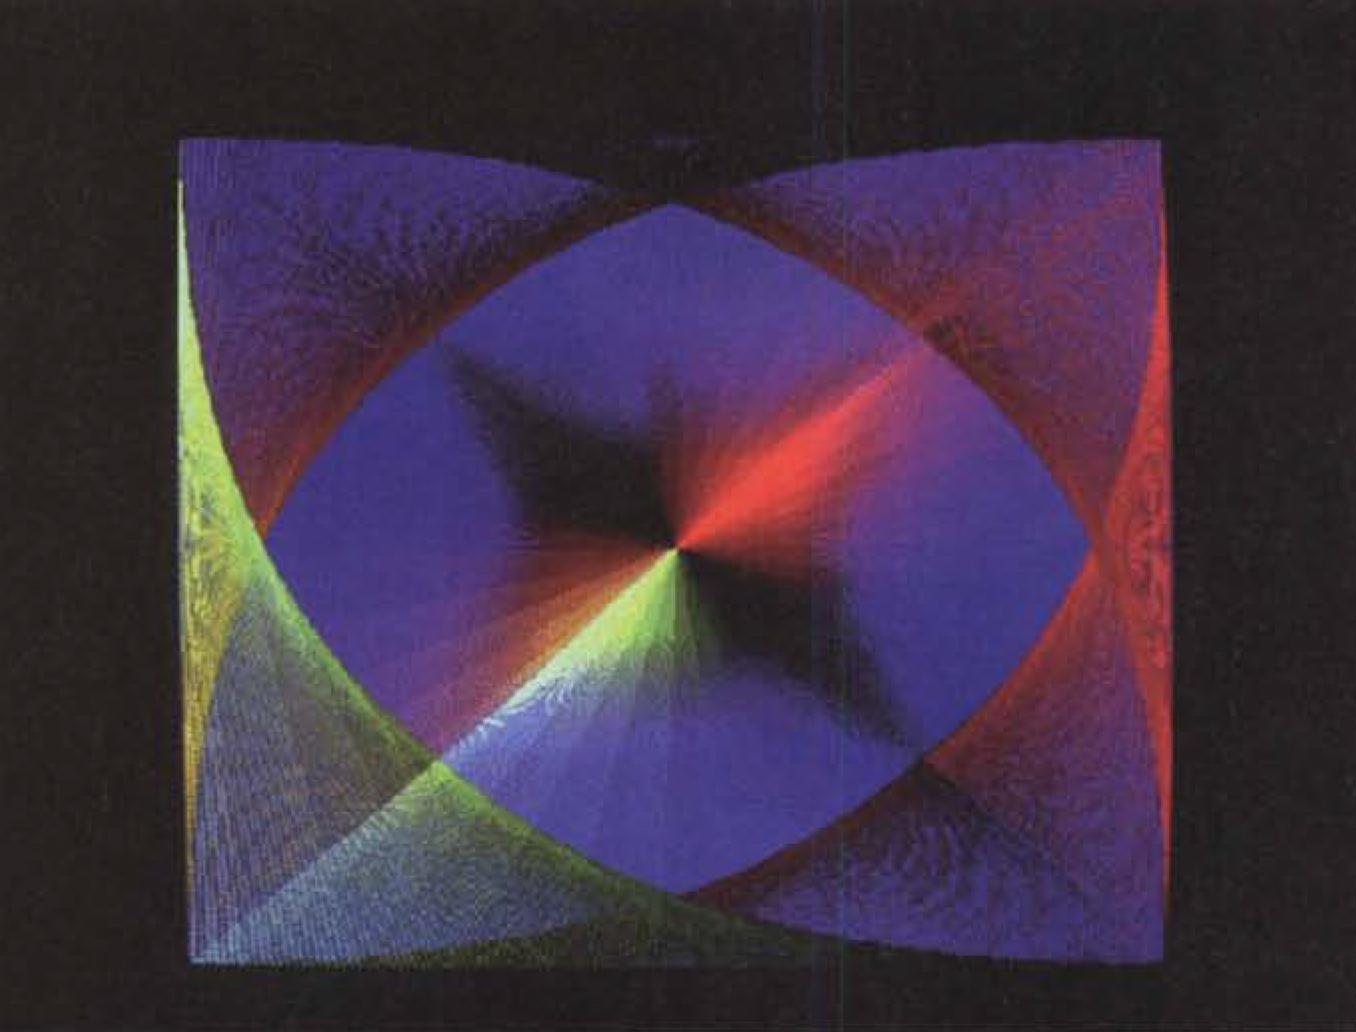 pietro-grossi-computer-music-pioneer-italy-04